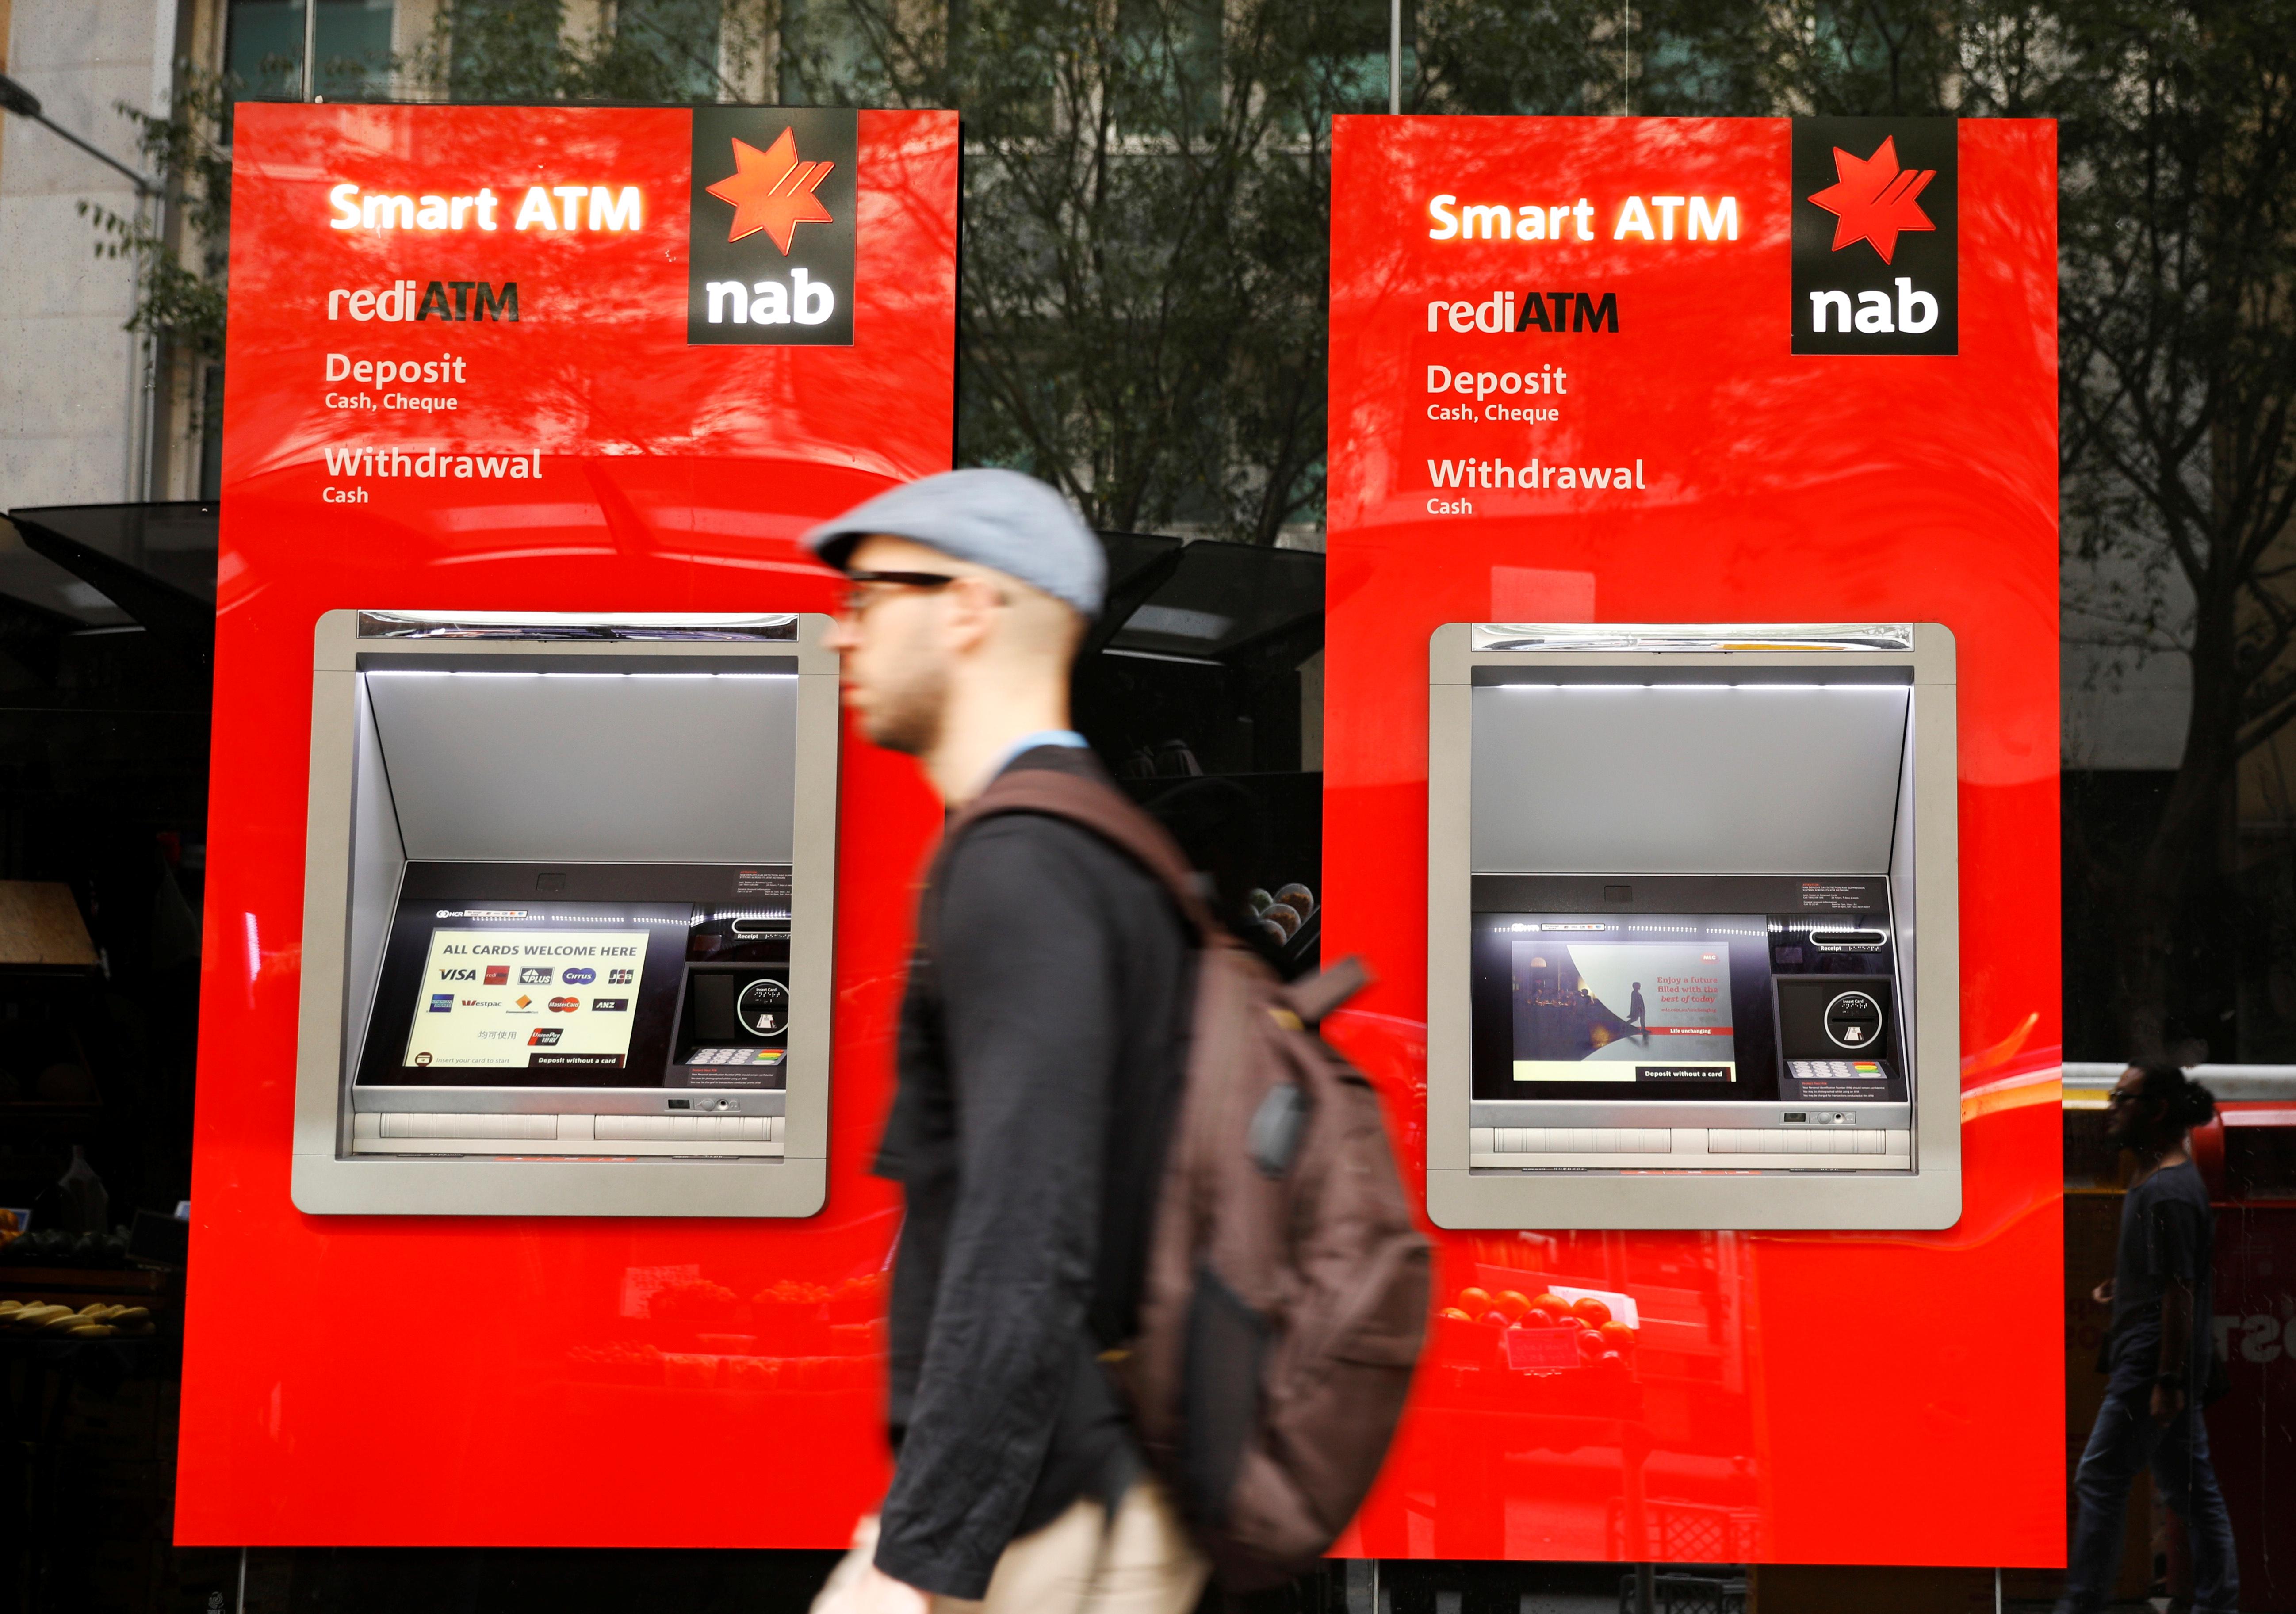 A man walks past ATM machines at a National Australia Bank branch in Sydney, Australia April 20, 2018. REUTERS/Edgar Su